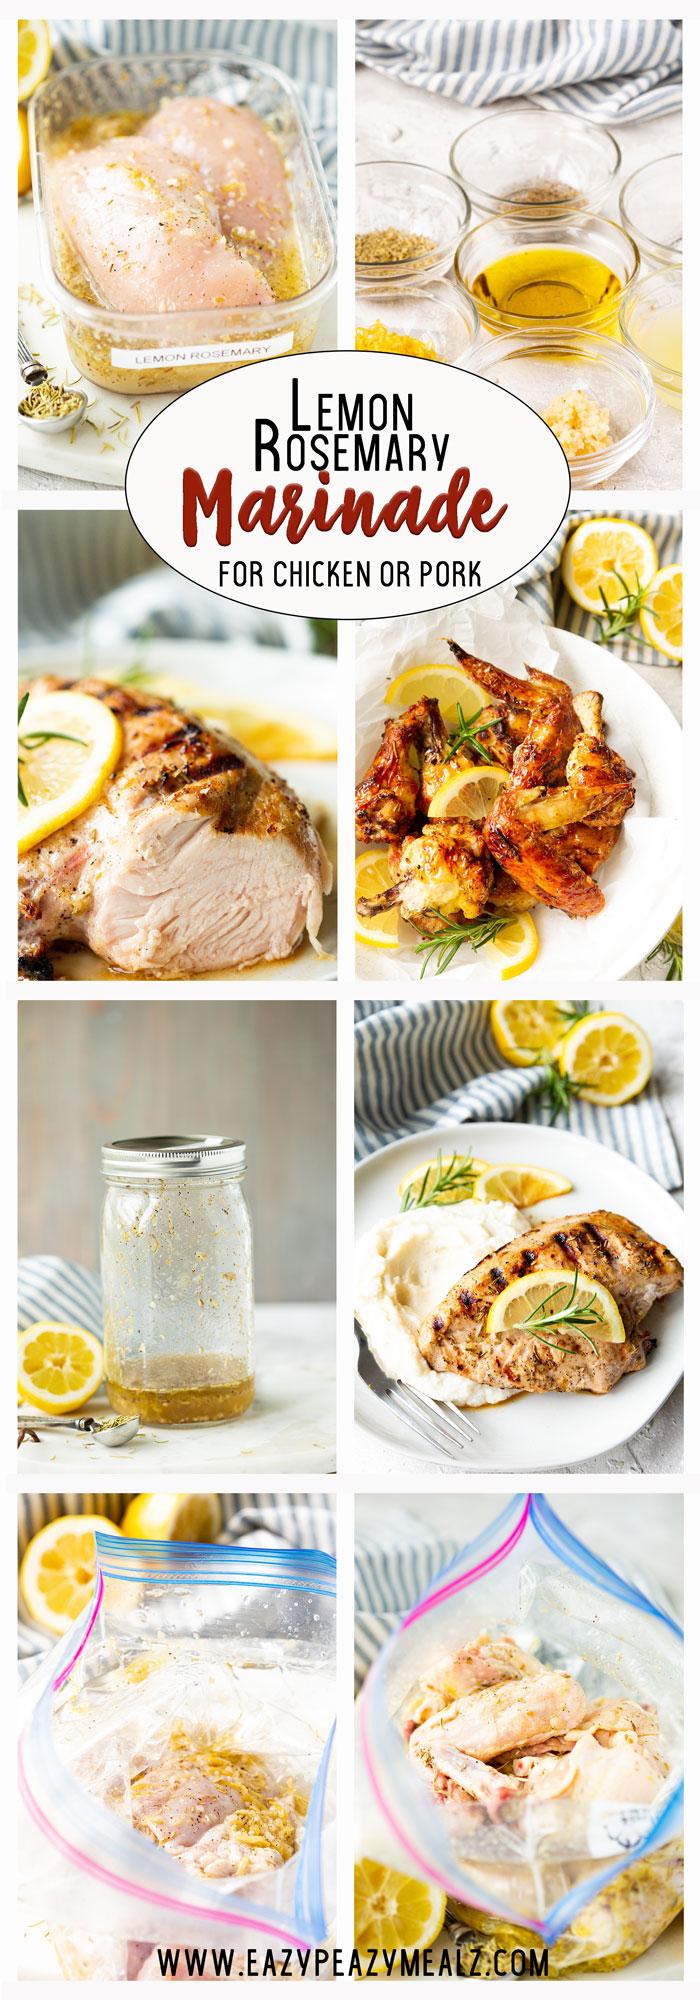 Lemon rosemary marinade